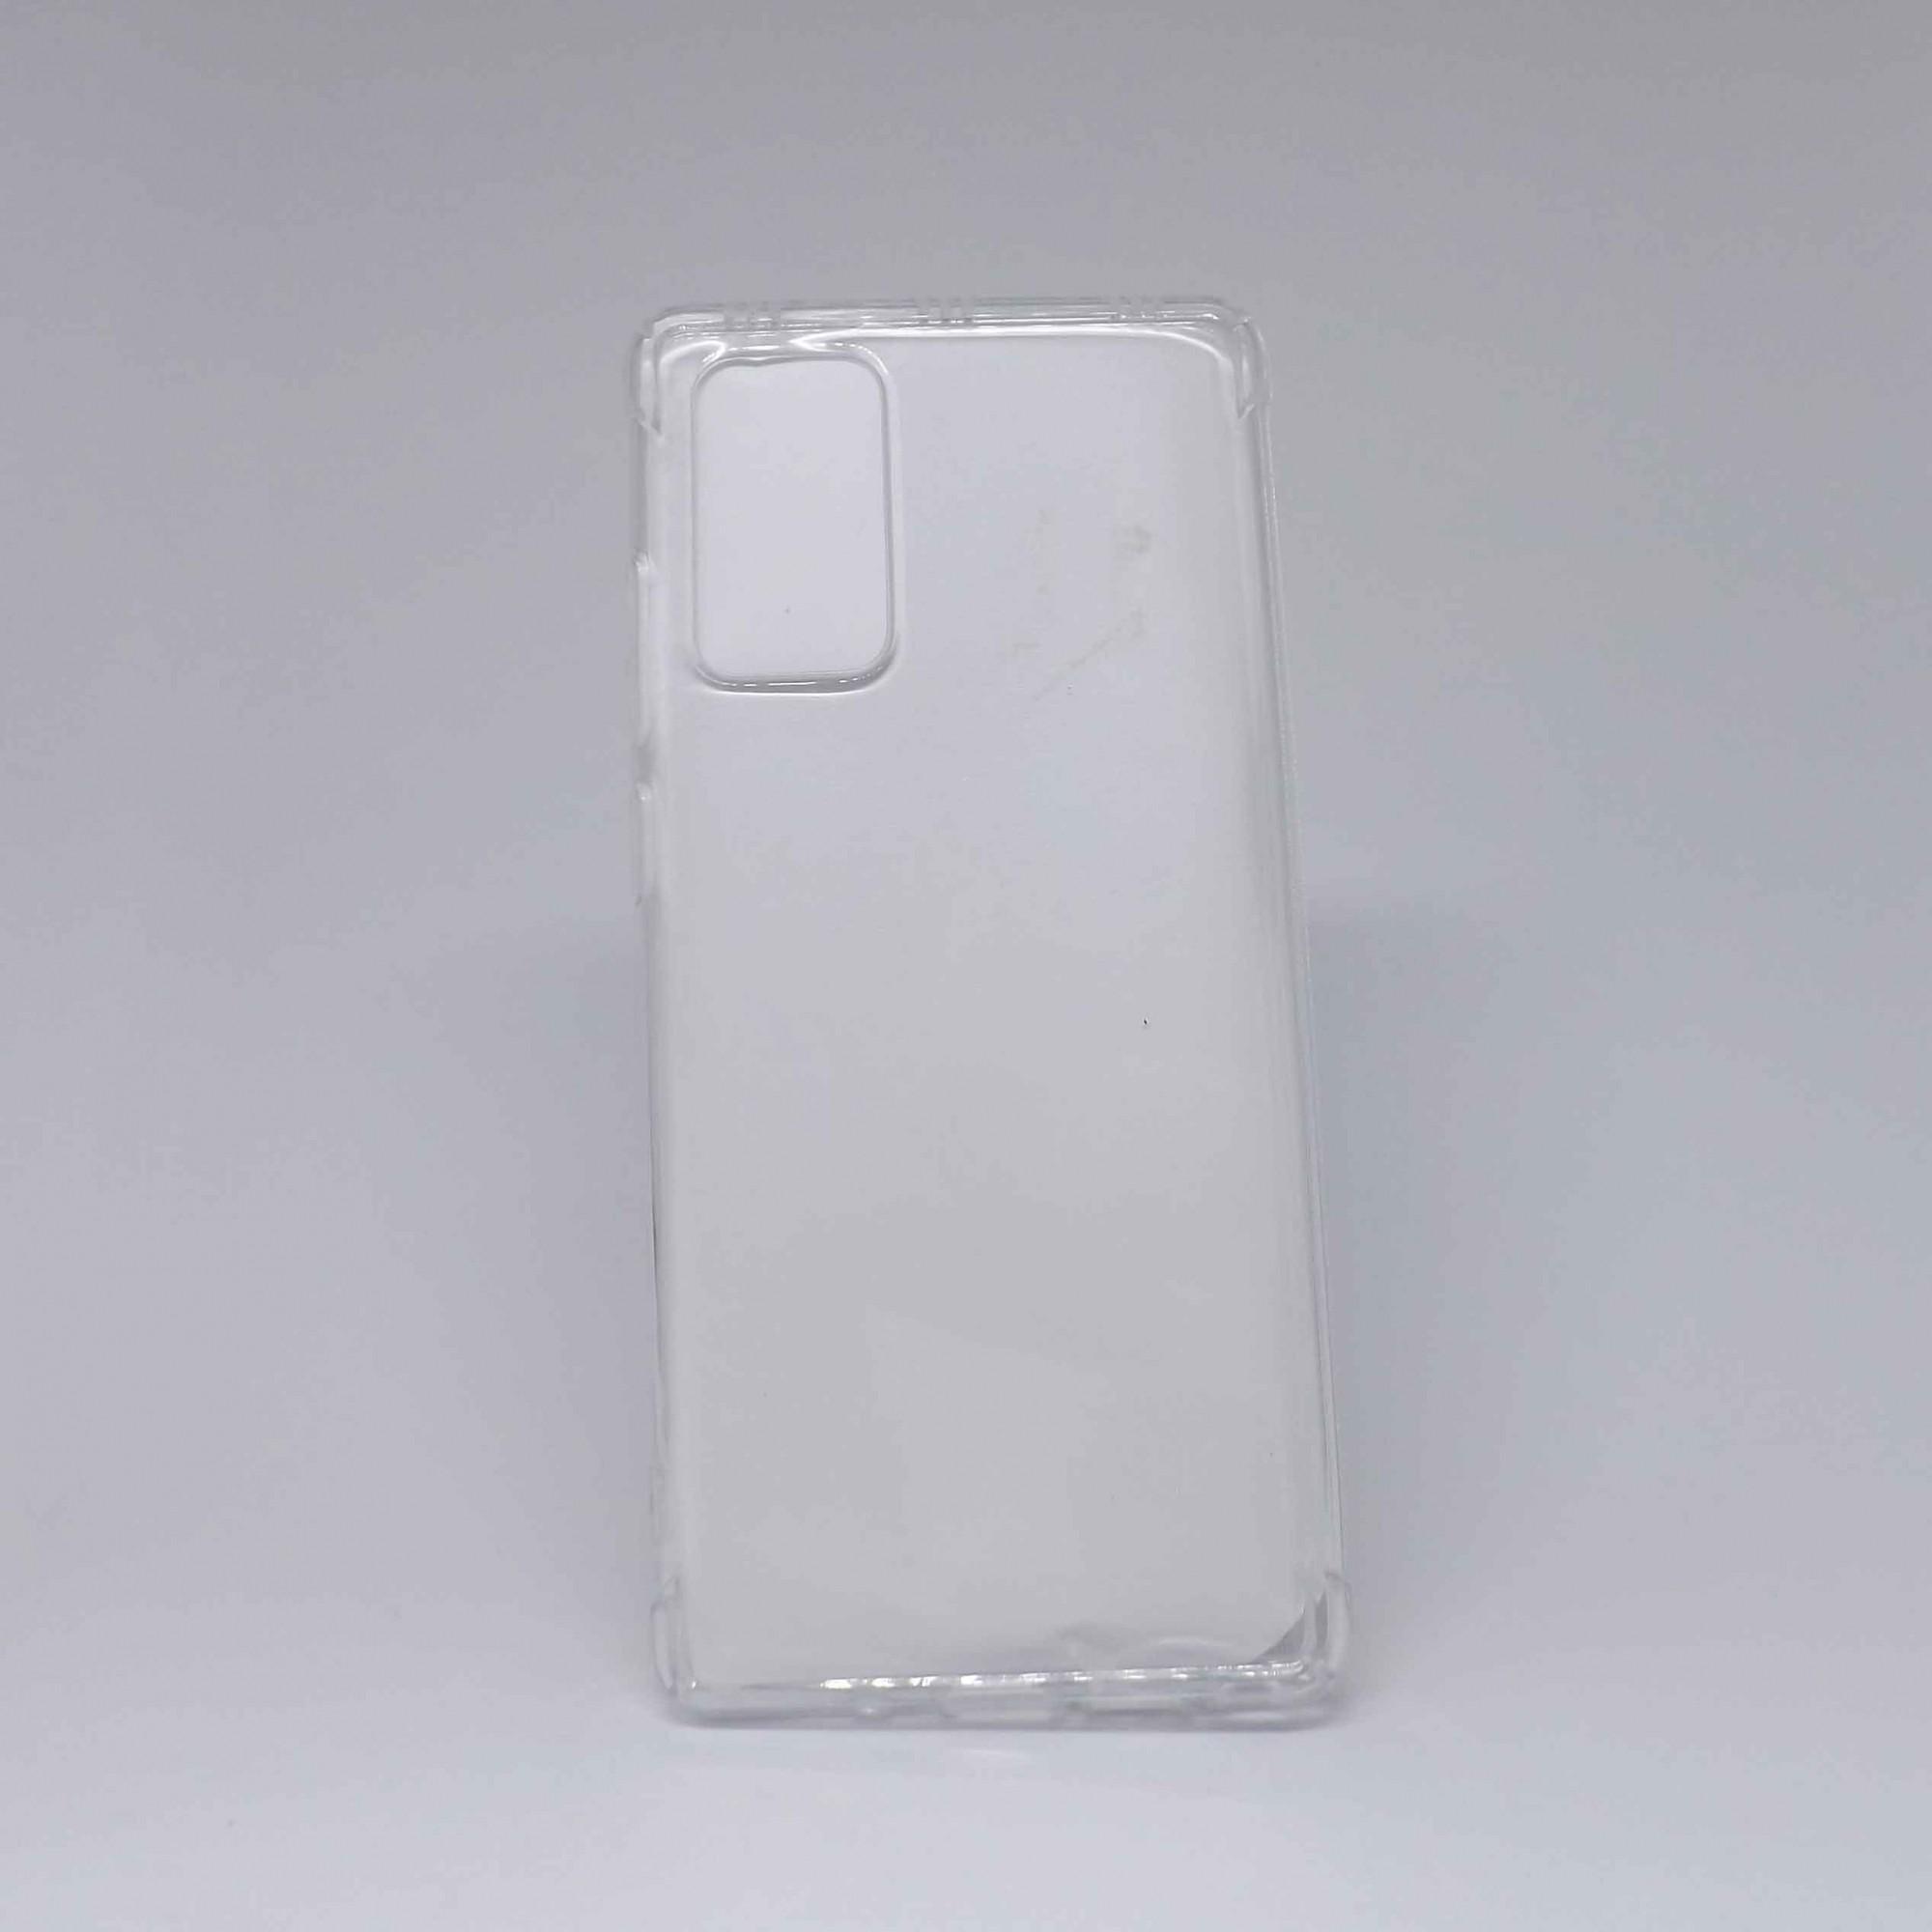 Capa Samsung Galaxy Note 20 Ultra